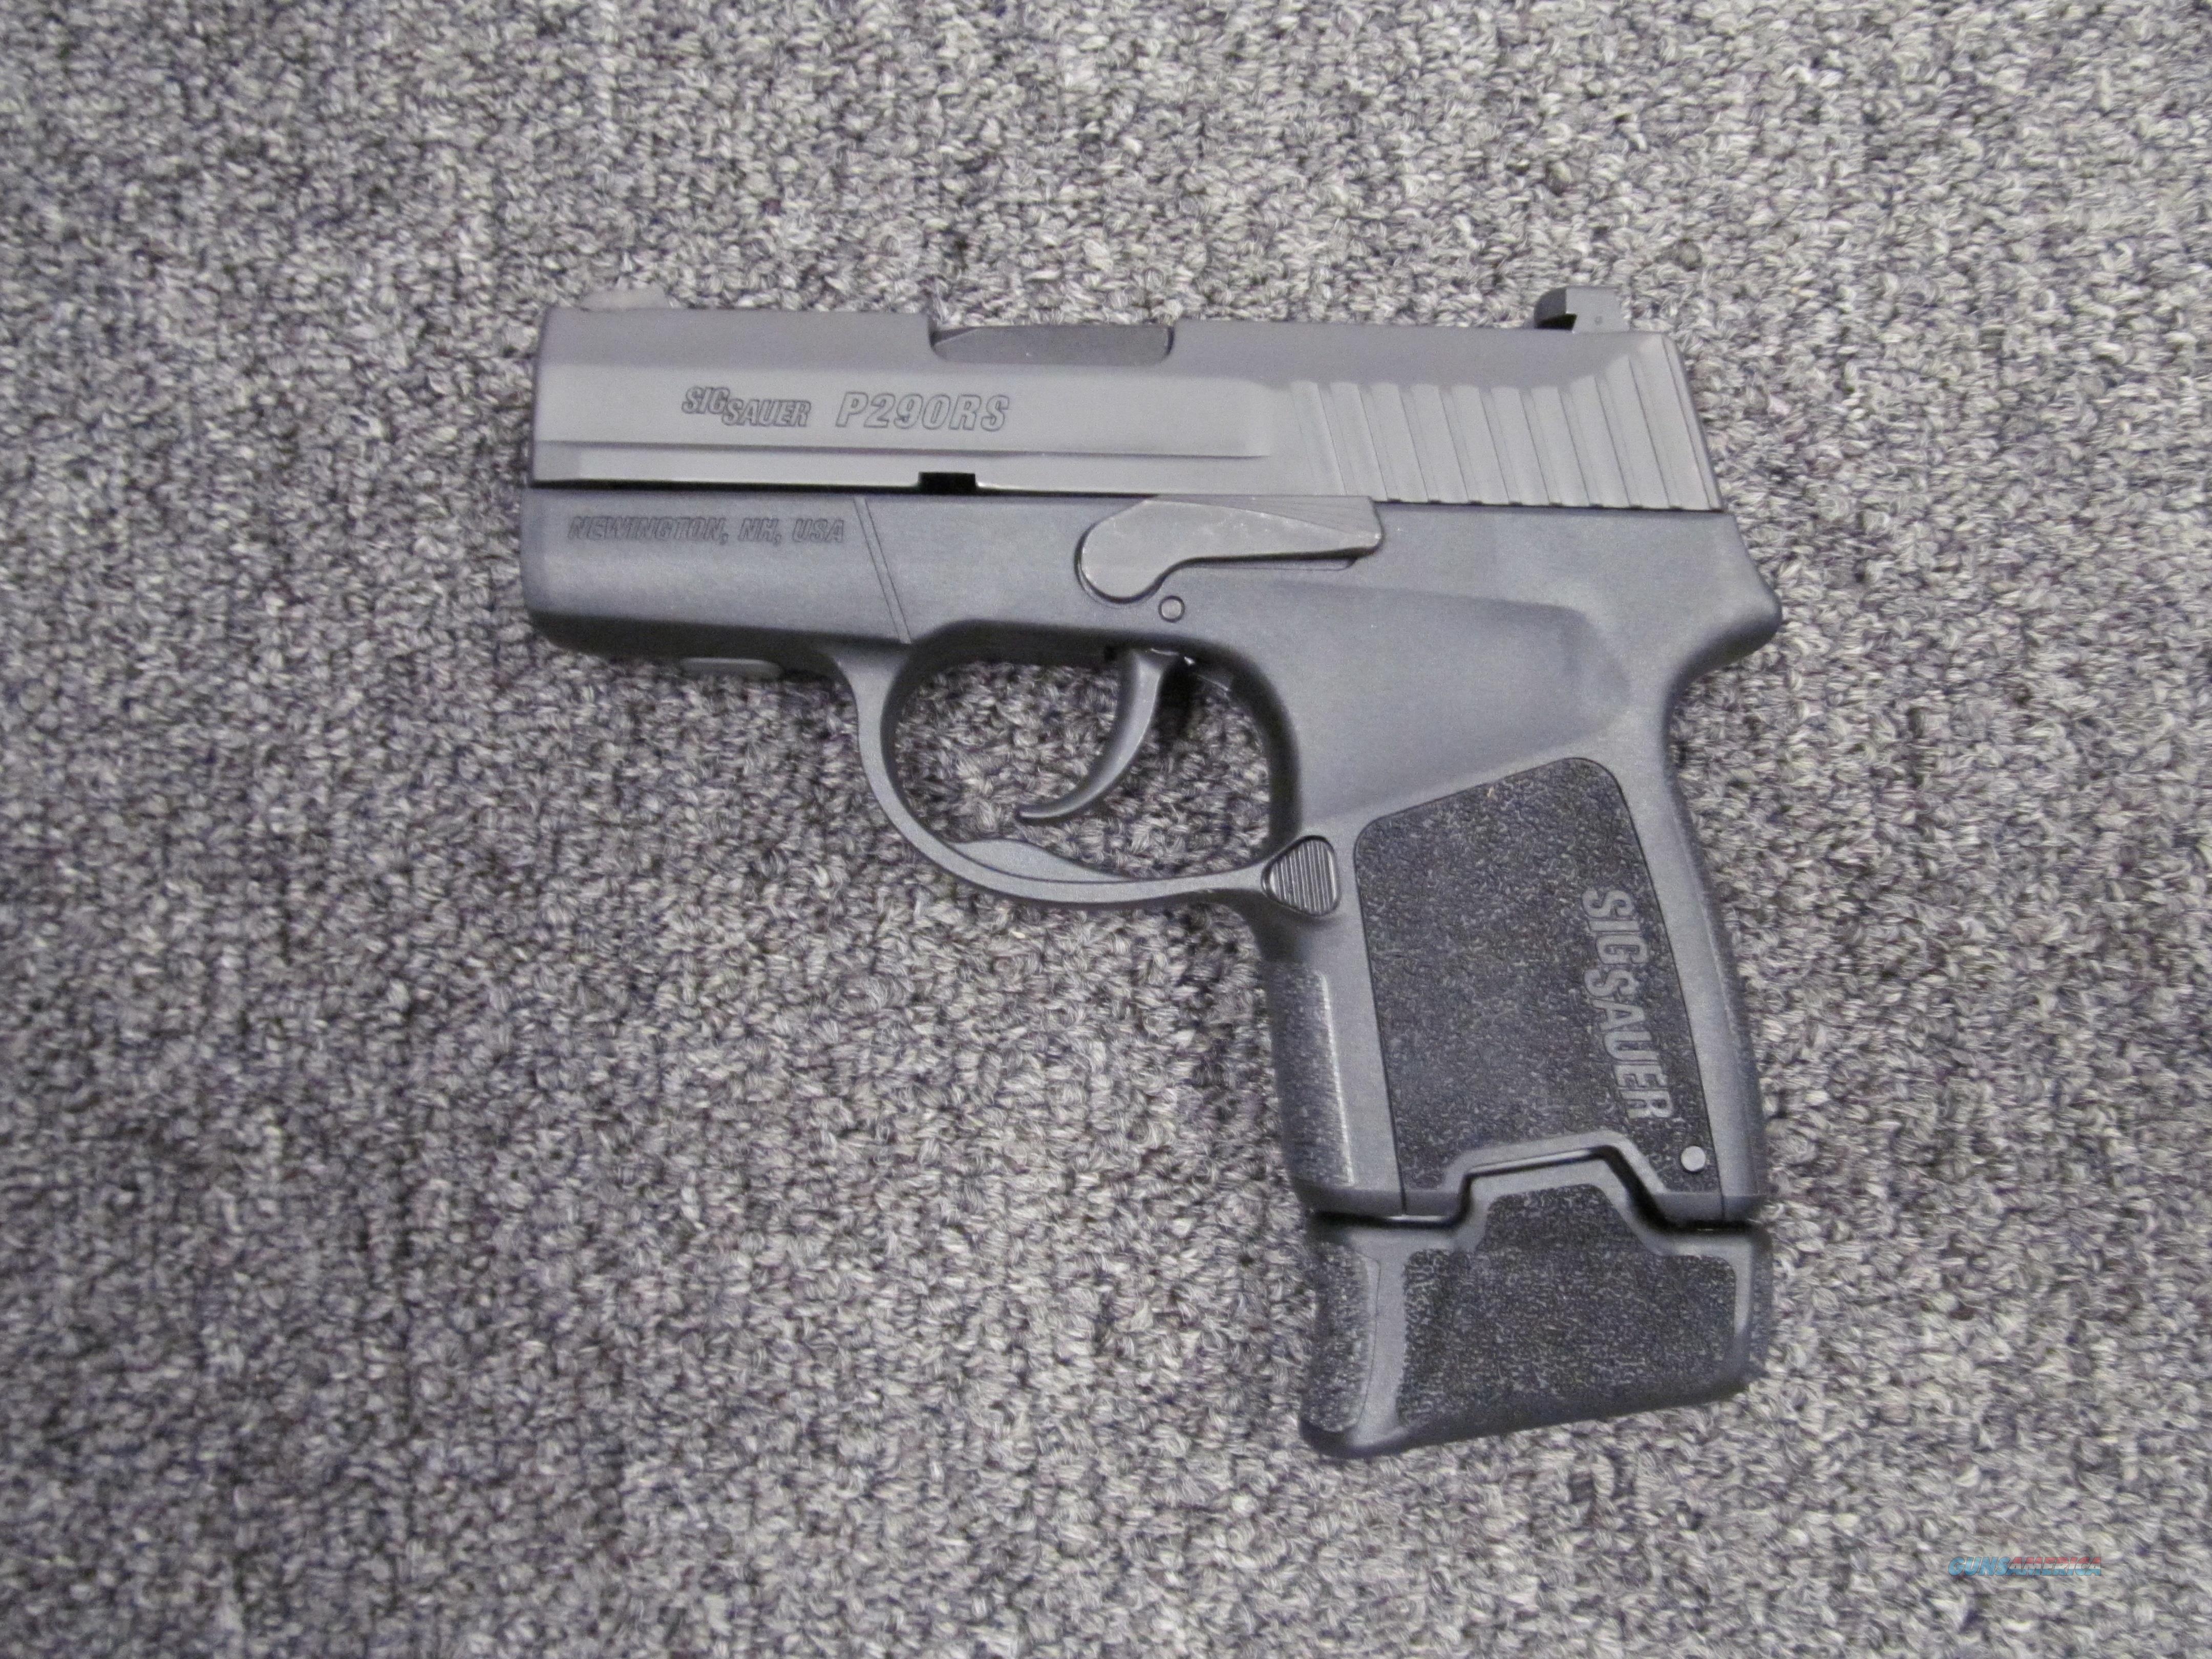 Sig Sauer P290 RS  Guns > Pistols > Sig - Sauer/Sigarms Pistols > P290